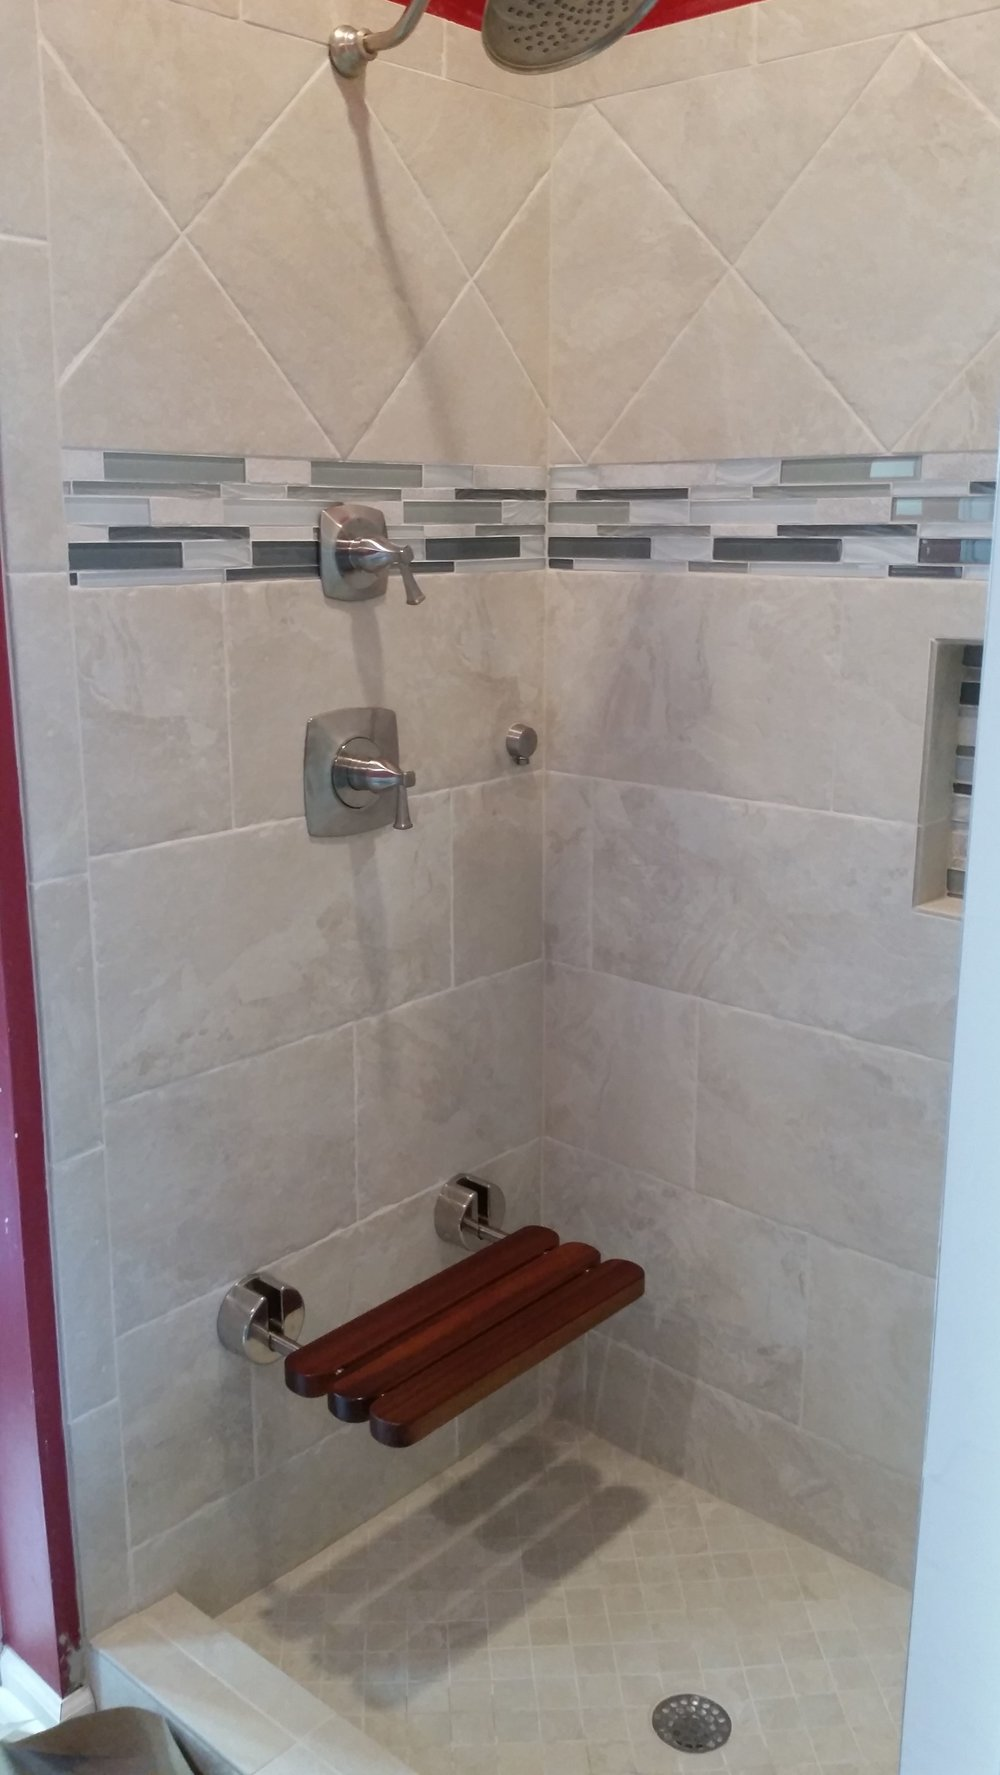 Tiled Shower & glass tile accents